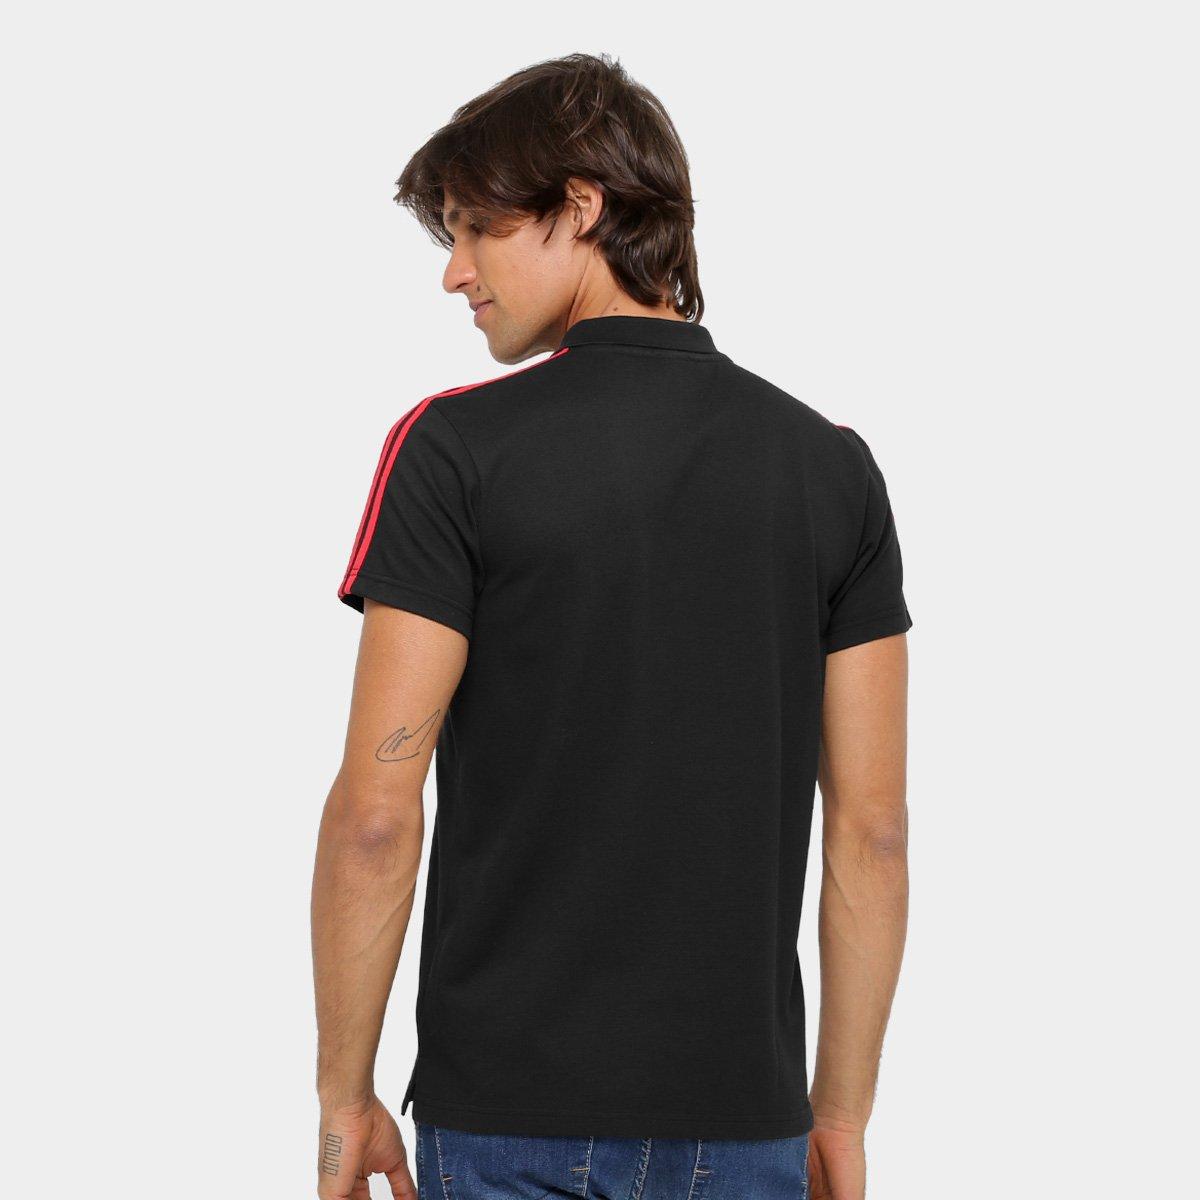 378371f2baecc Camisa Polo Adidas Flamengo 3S - Compre Agora